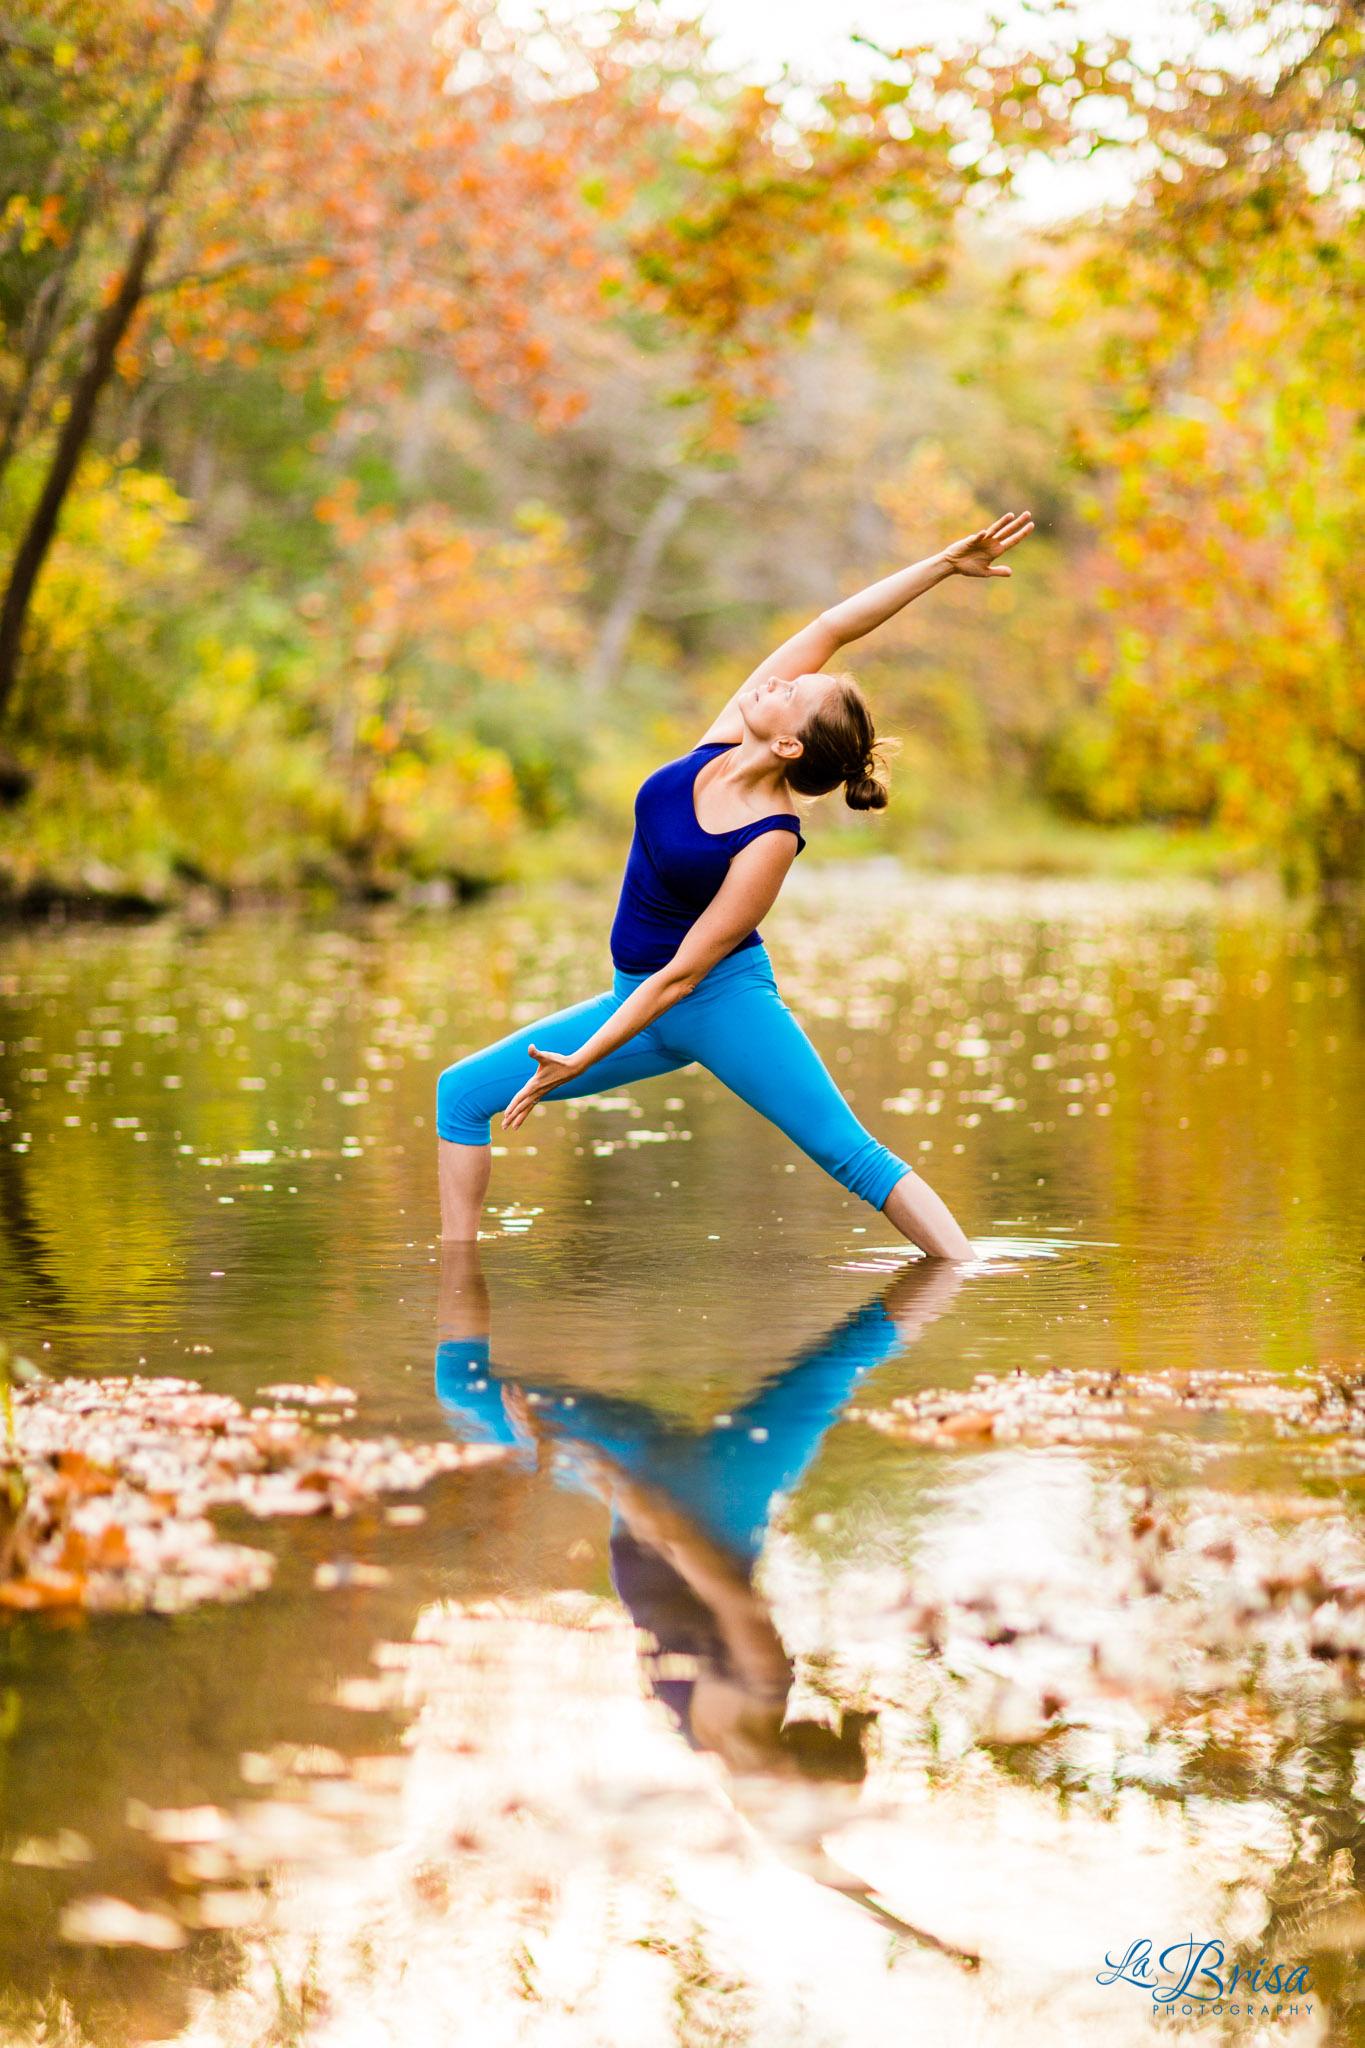 Outdoor Yoga Poses By Orange Sky Yoga Instructors